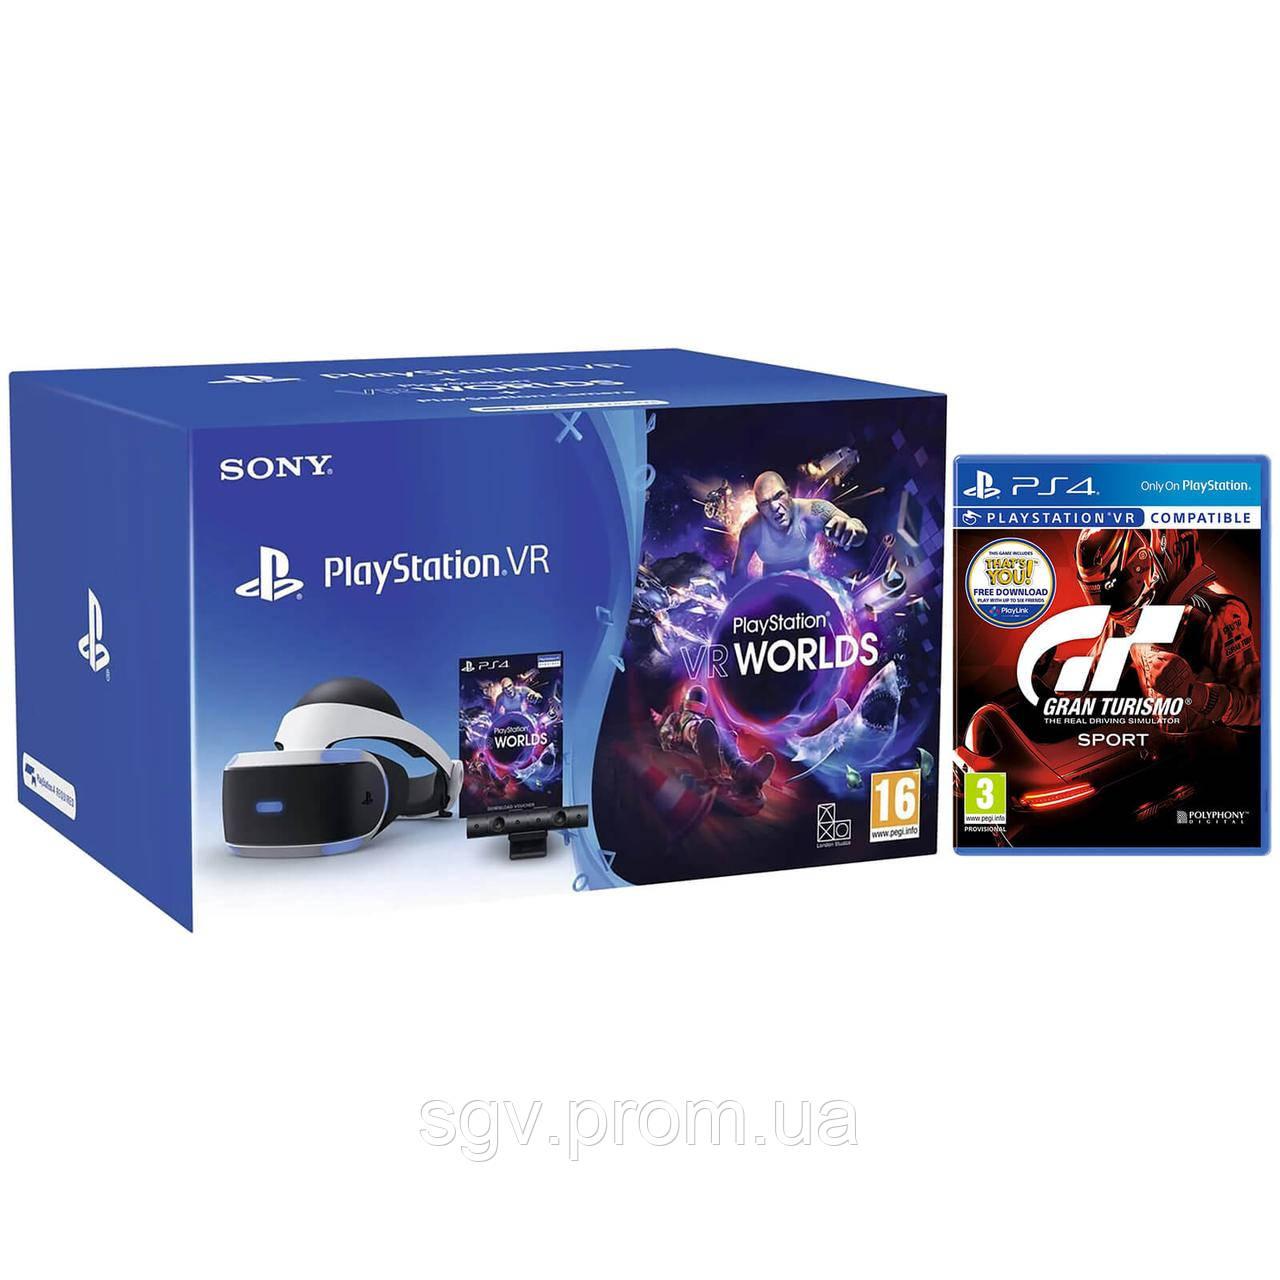 Шлем виртуальной реальности PlayStation VR (Bundle) + Gran Turismo + камера  PlayStation Eye + 9c5dd6e8e4e19